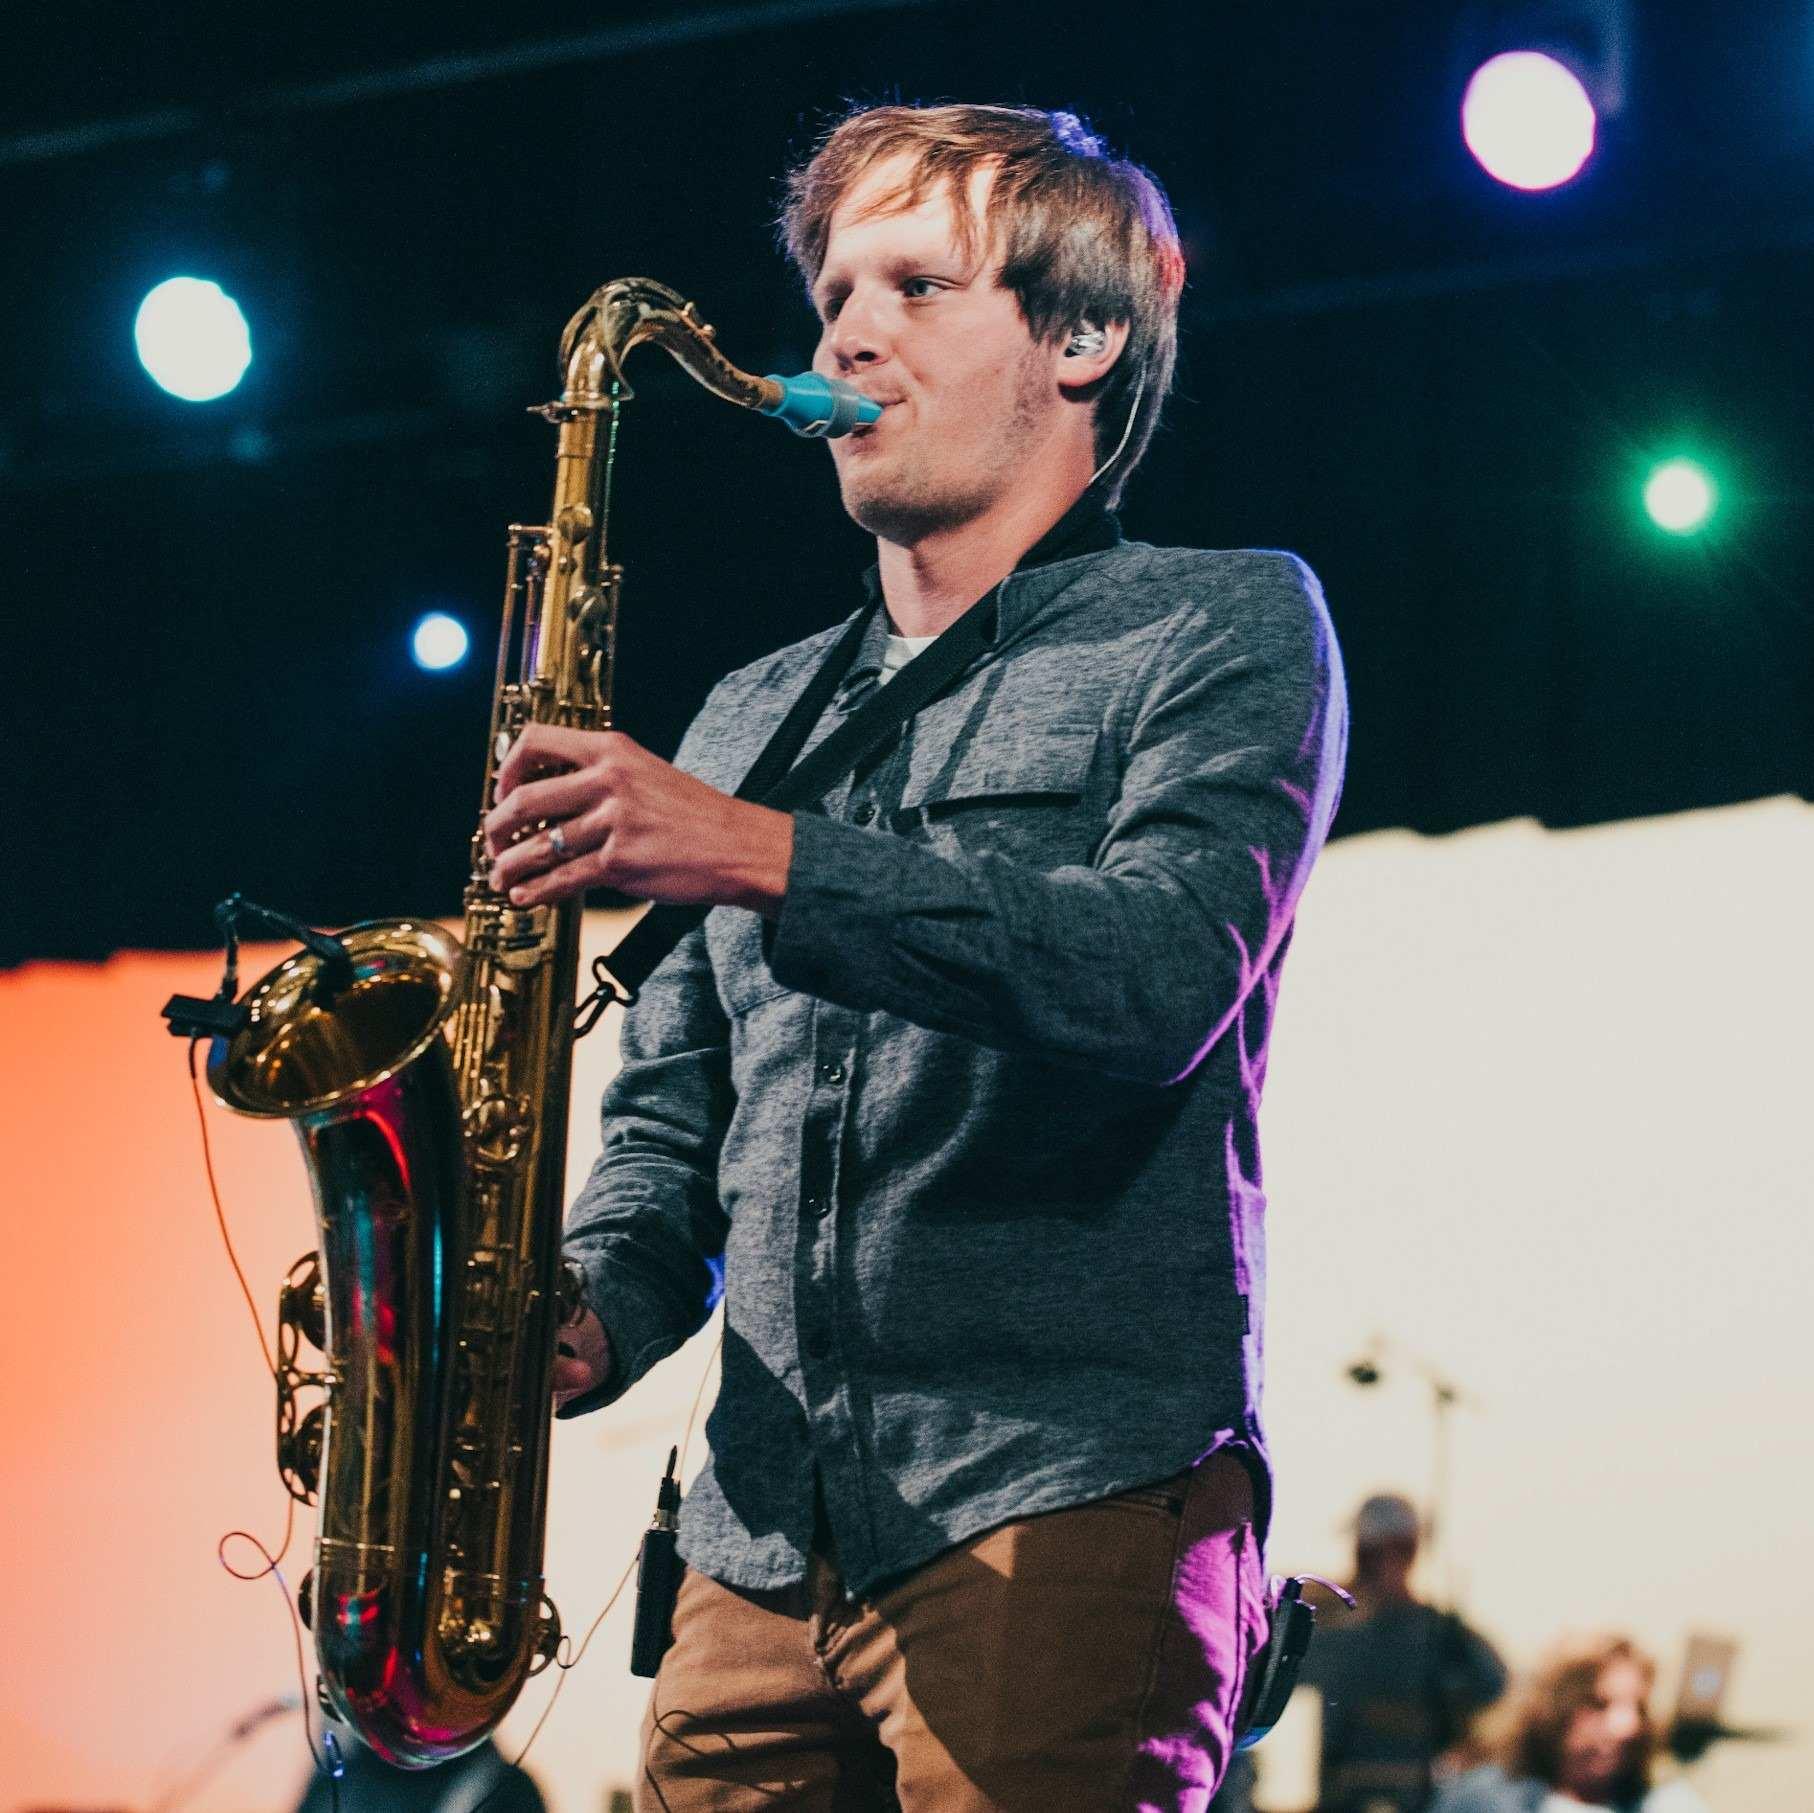 Joe Scheller joue un bec Syos au saxophone ténor